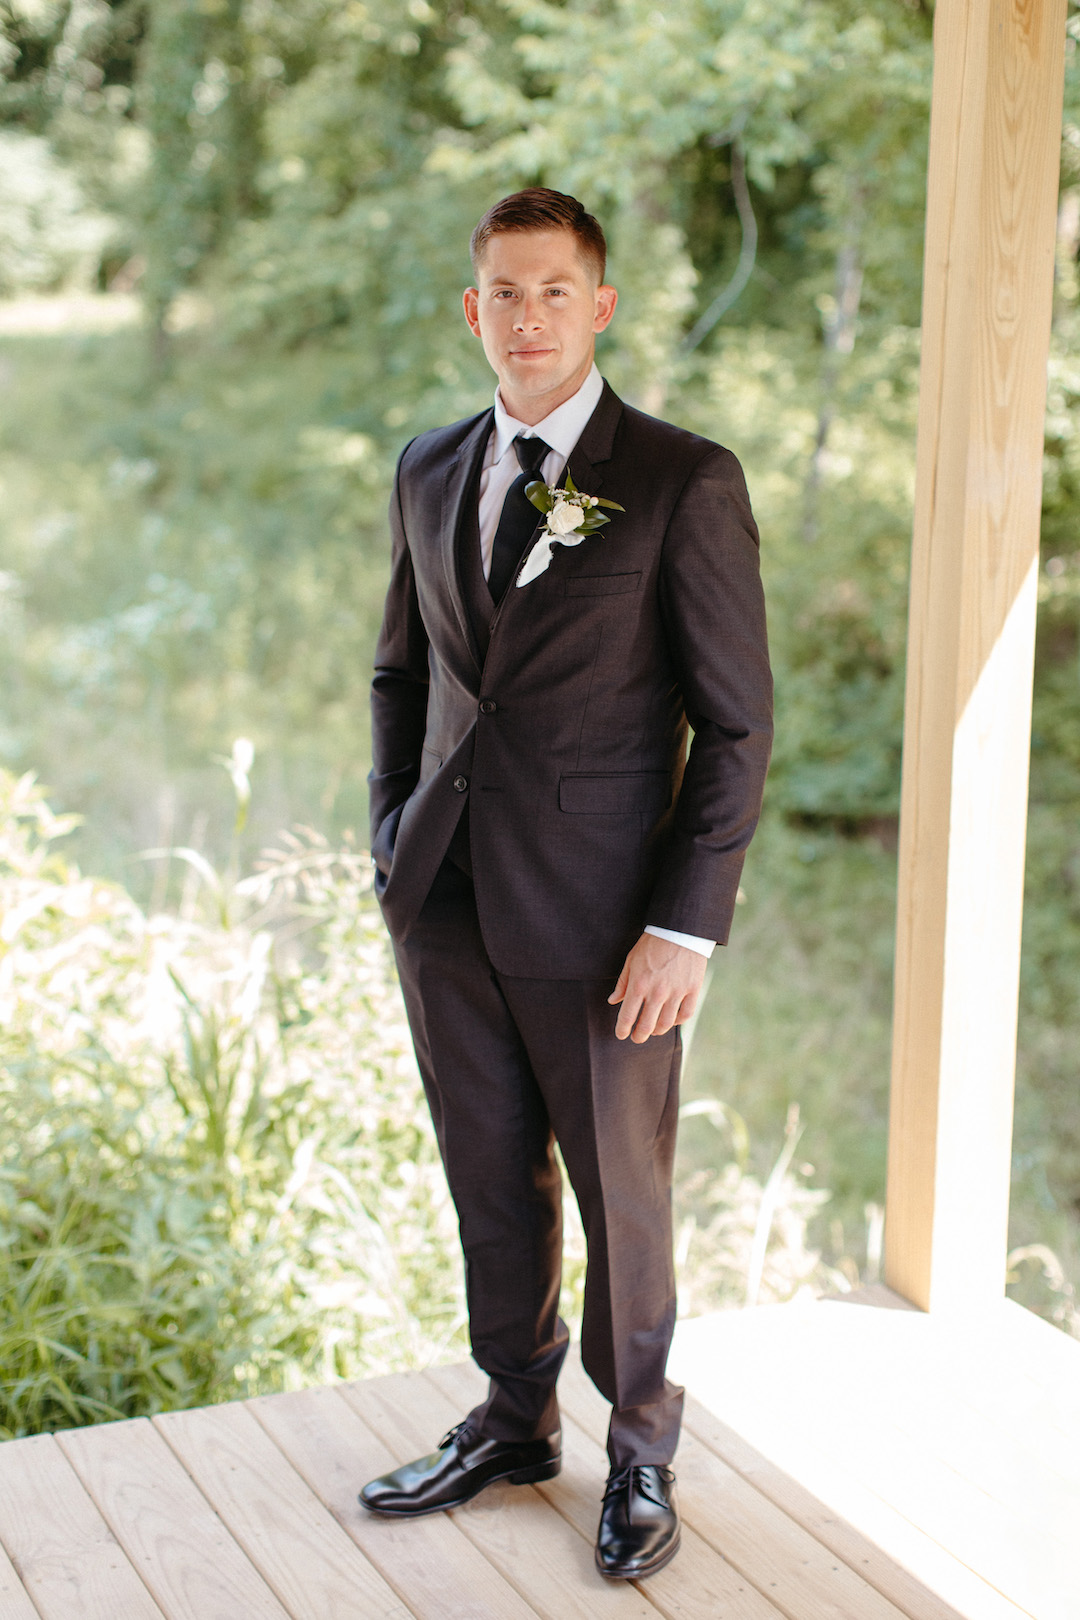 Tennessee wedding photographer Gipe photography